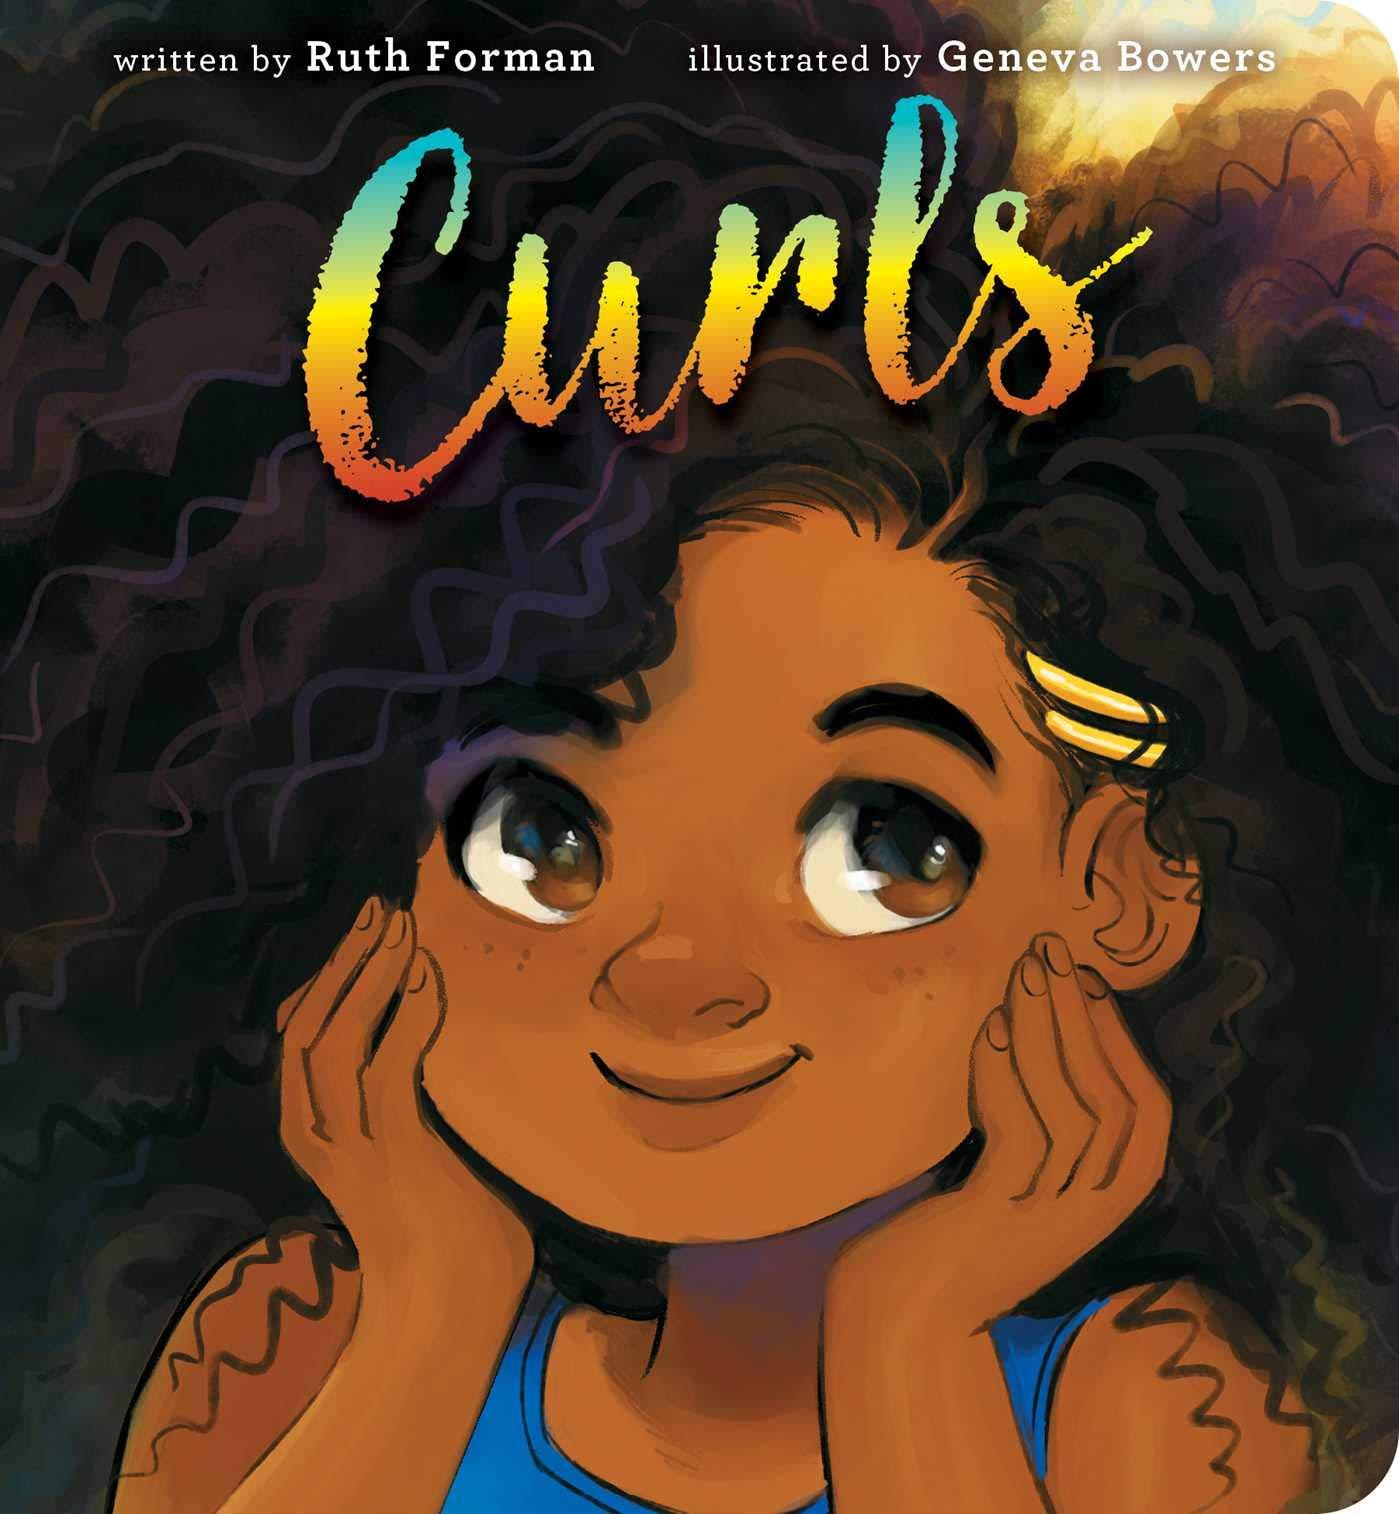 Curls: Forman, Ruth, Bowers, Geneva: 9781534446311: Amazon.com: Books